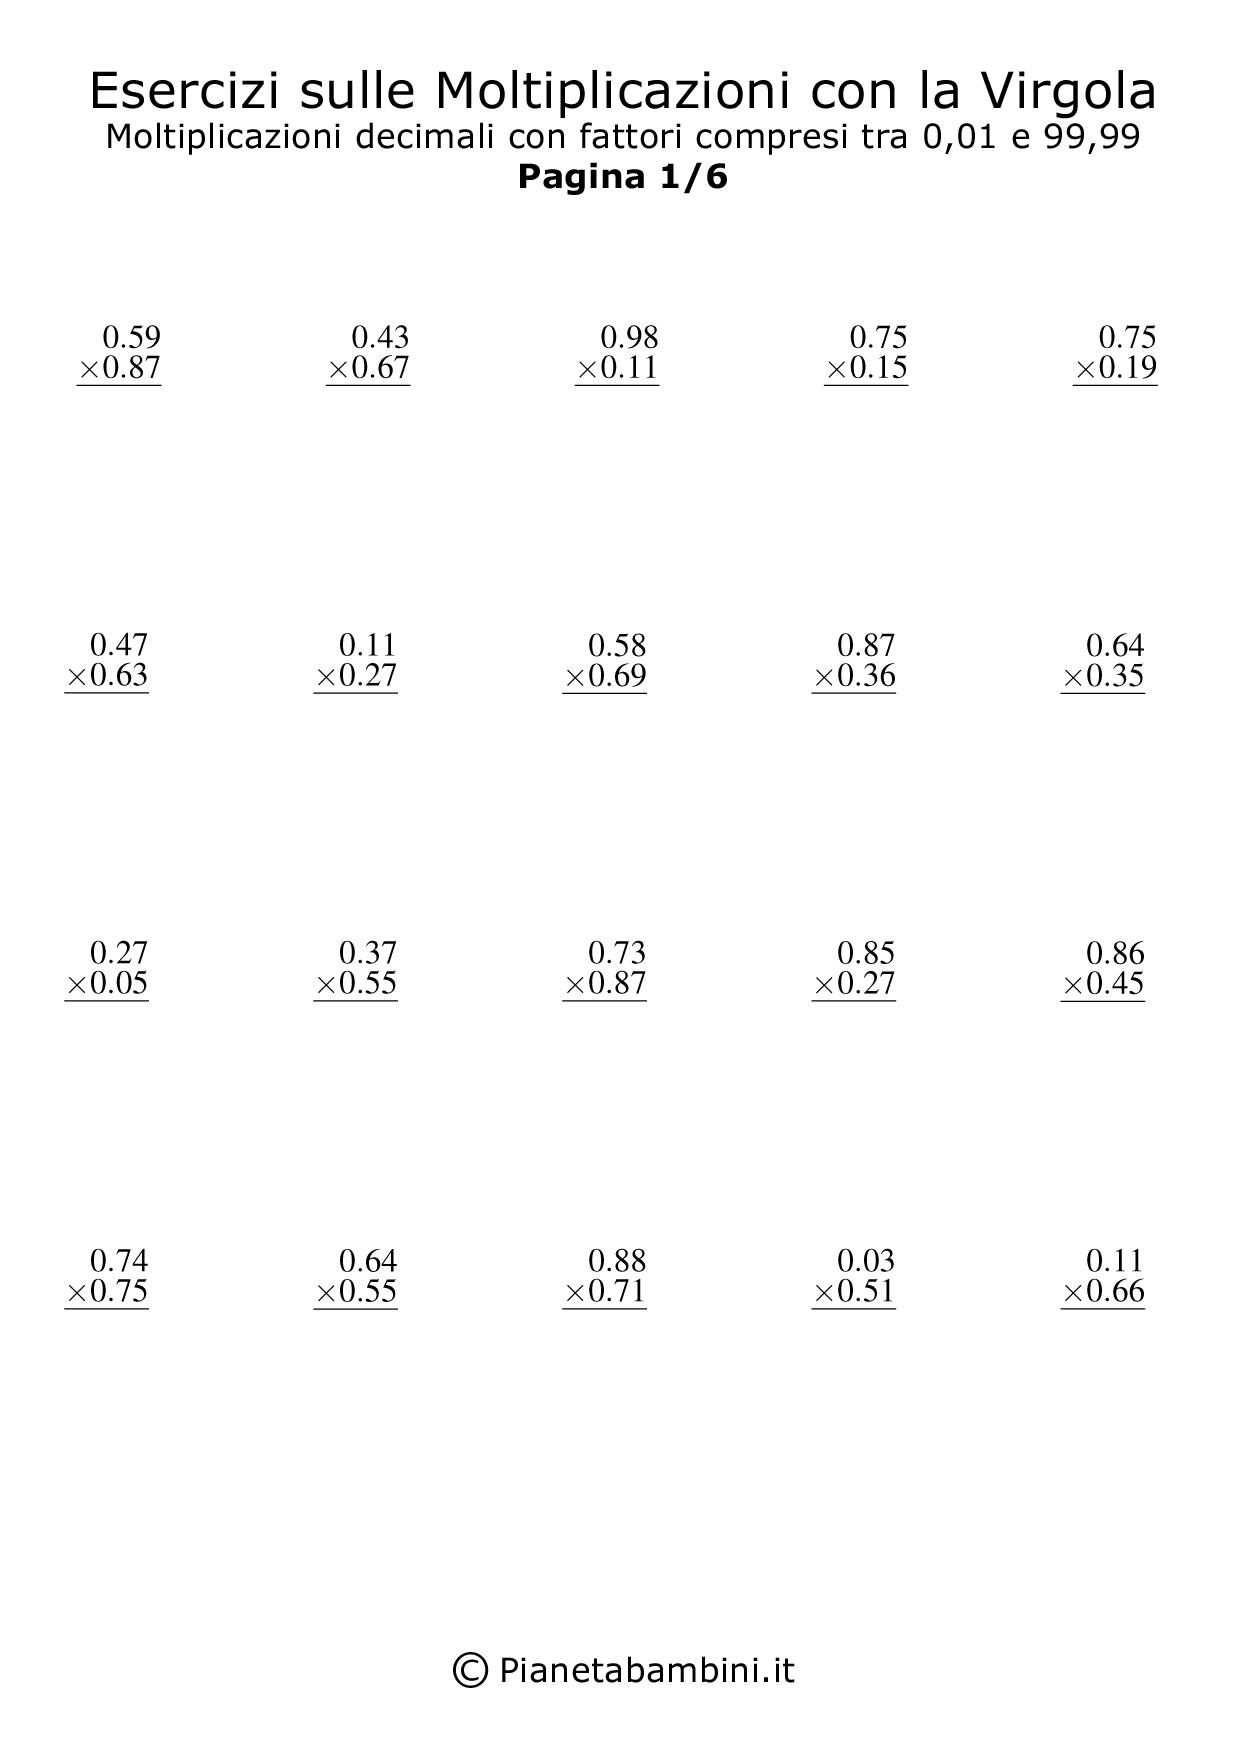 Moltiplicazioni-Virgola-0.01-99.99_1